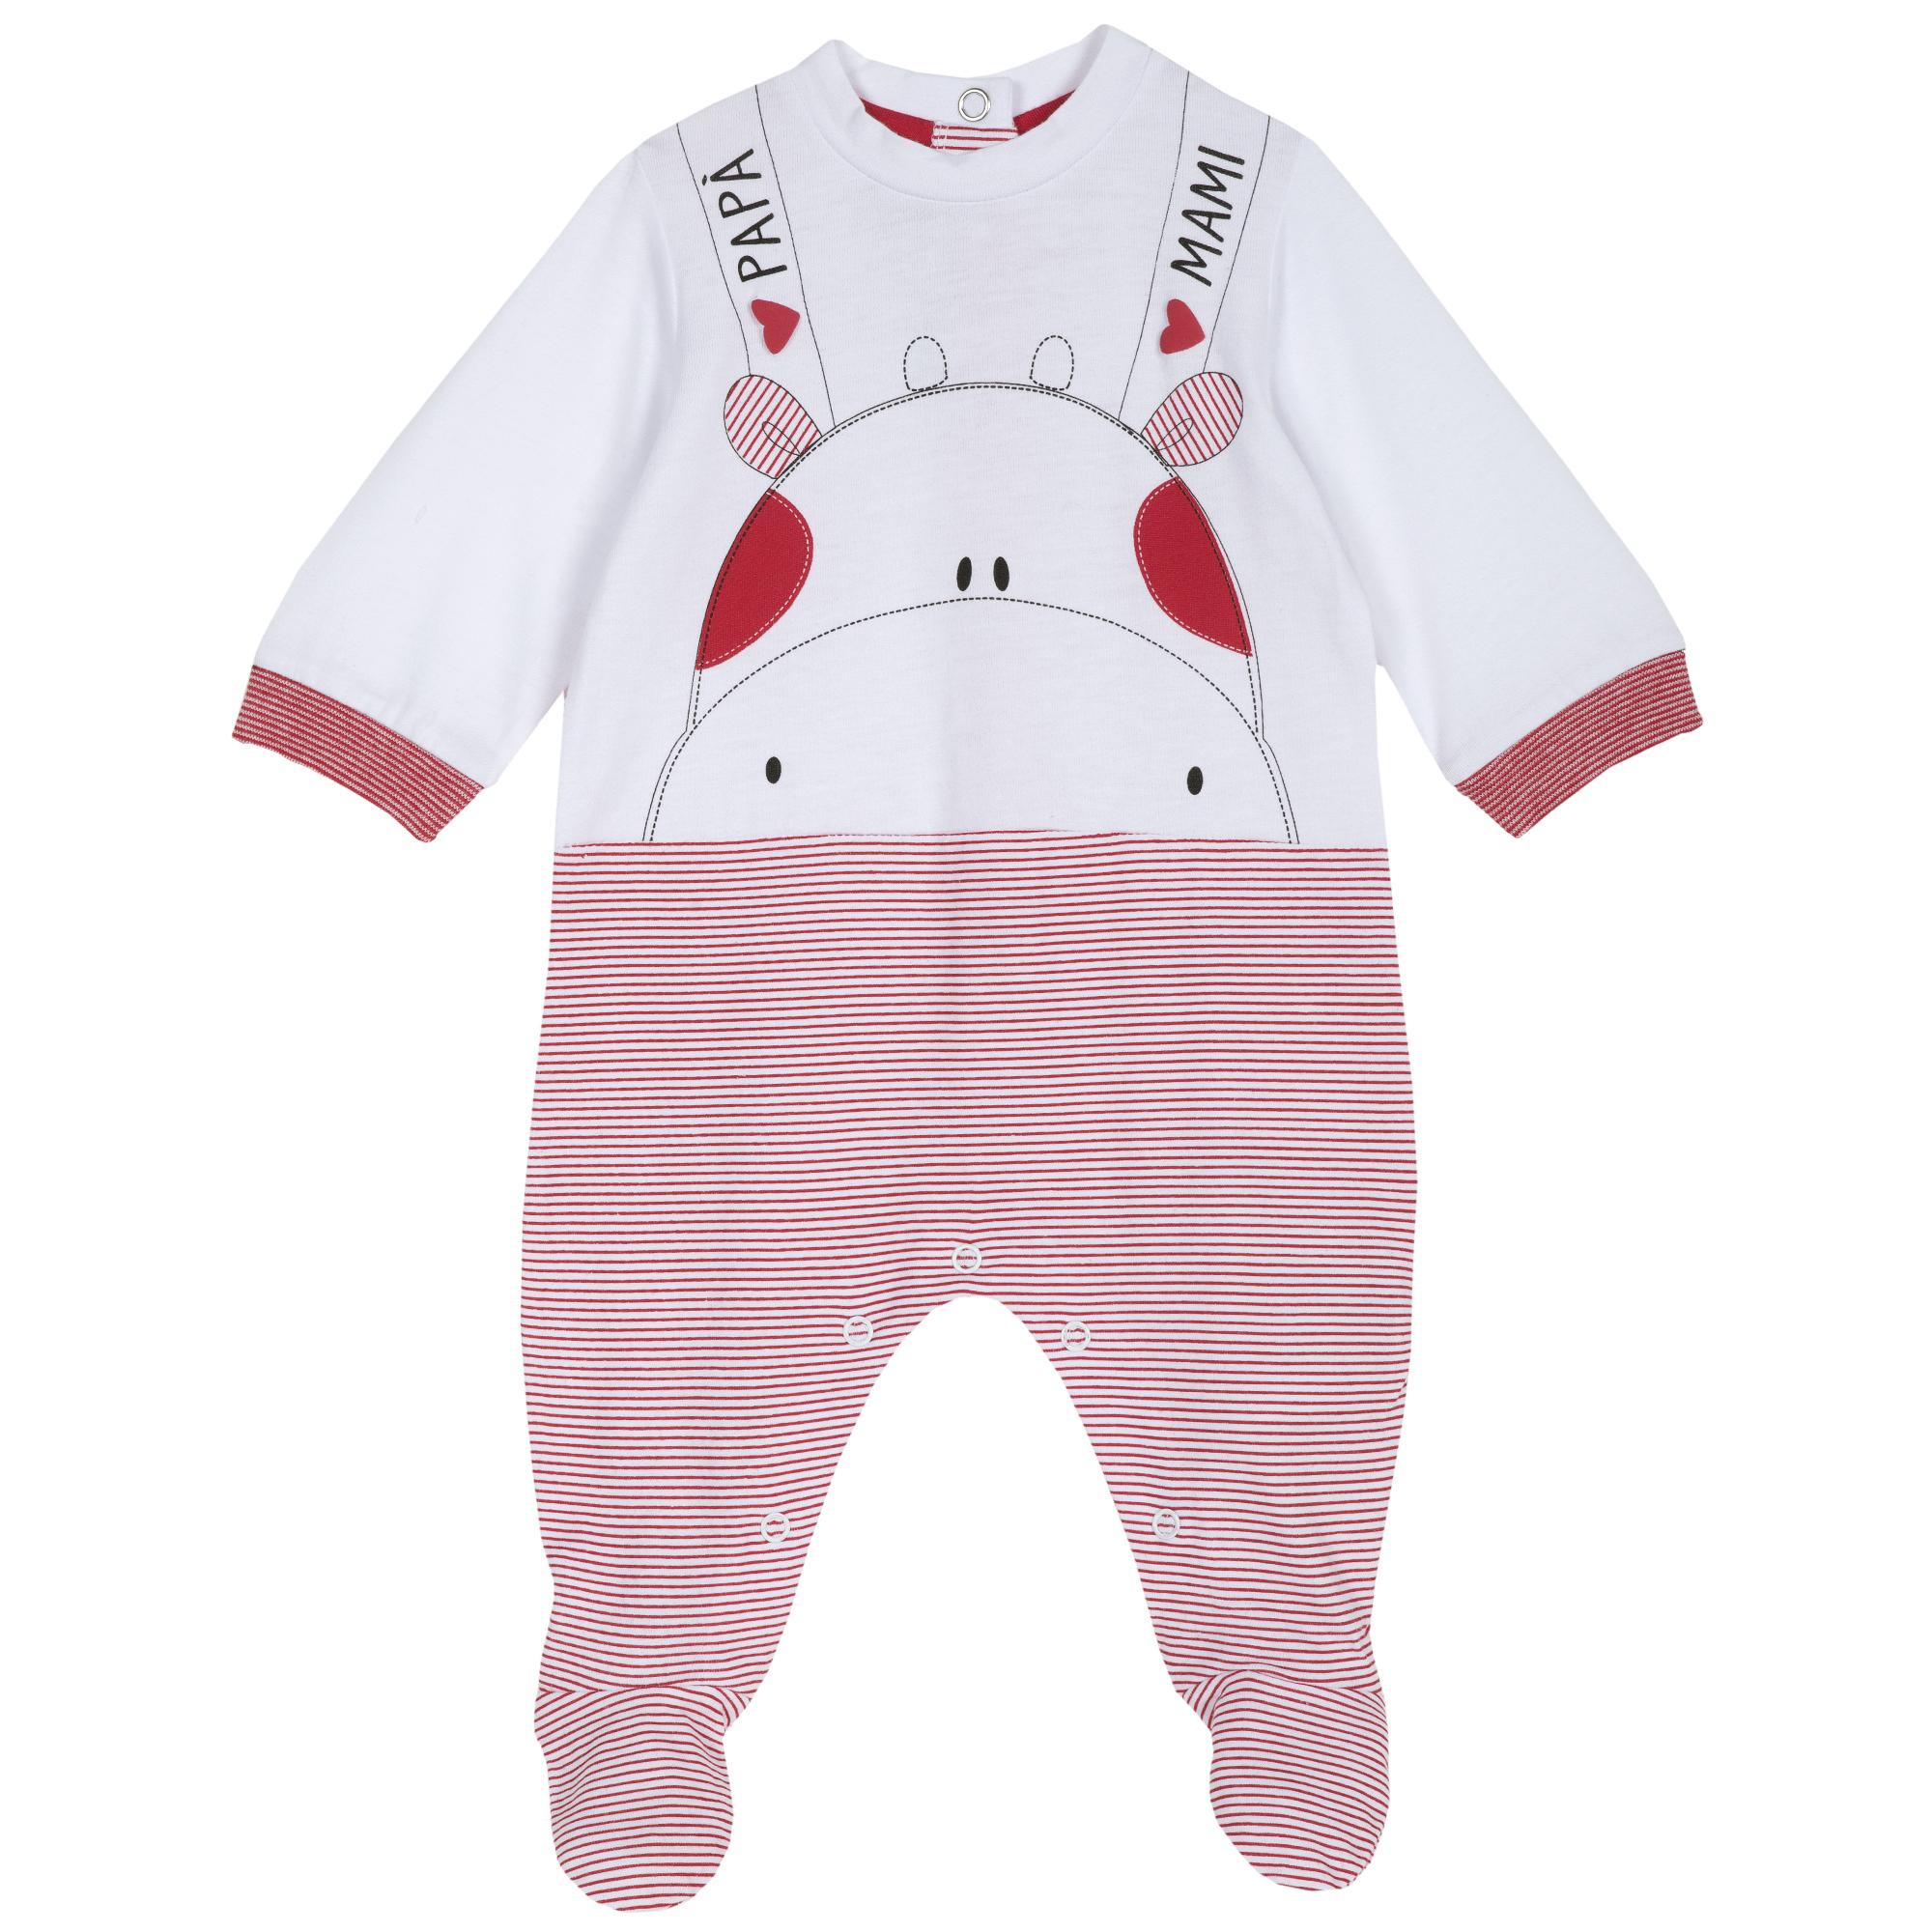 Salopeta bebe Chicco, maneca lunga, rosu cu alb, 21745 din categoria Salopete/Body